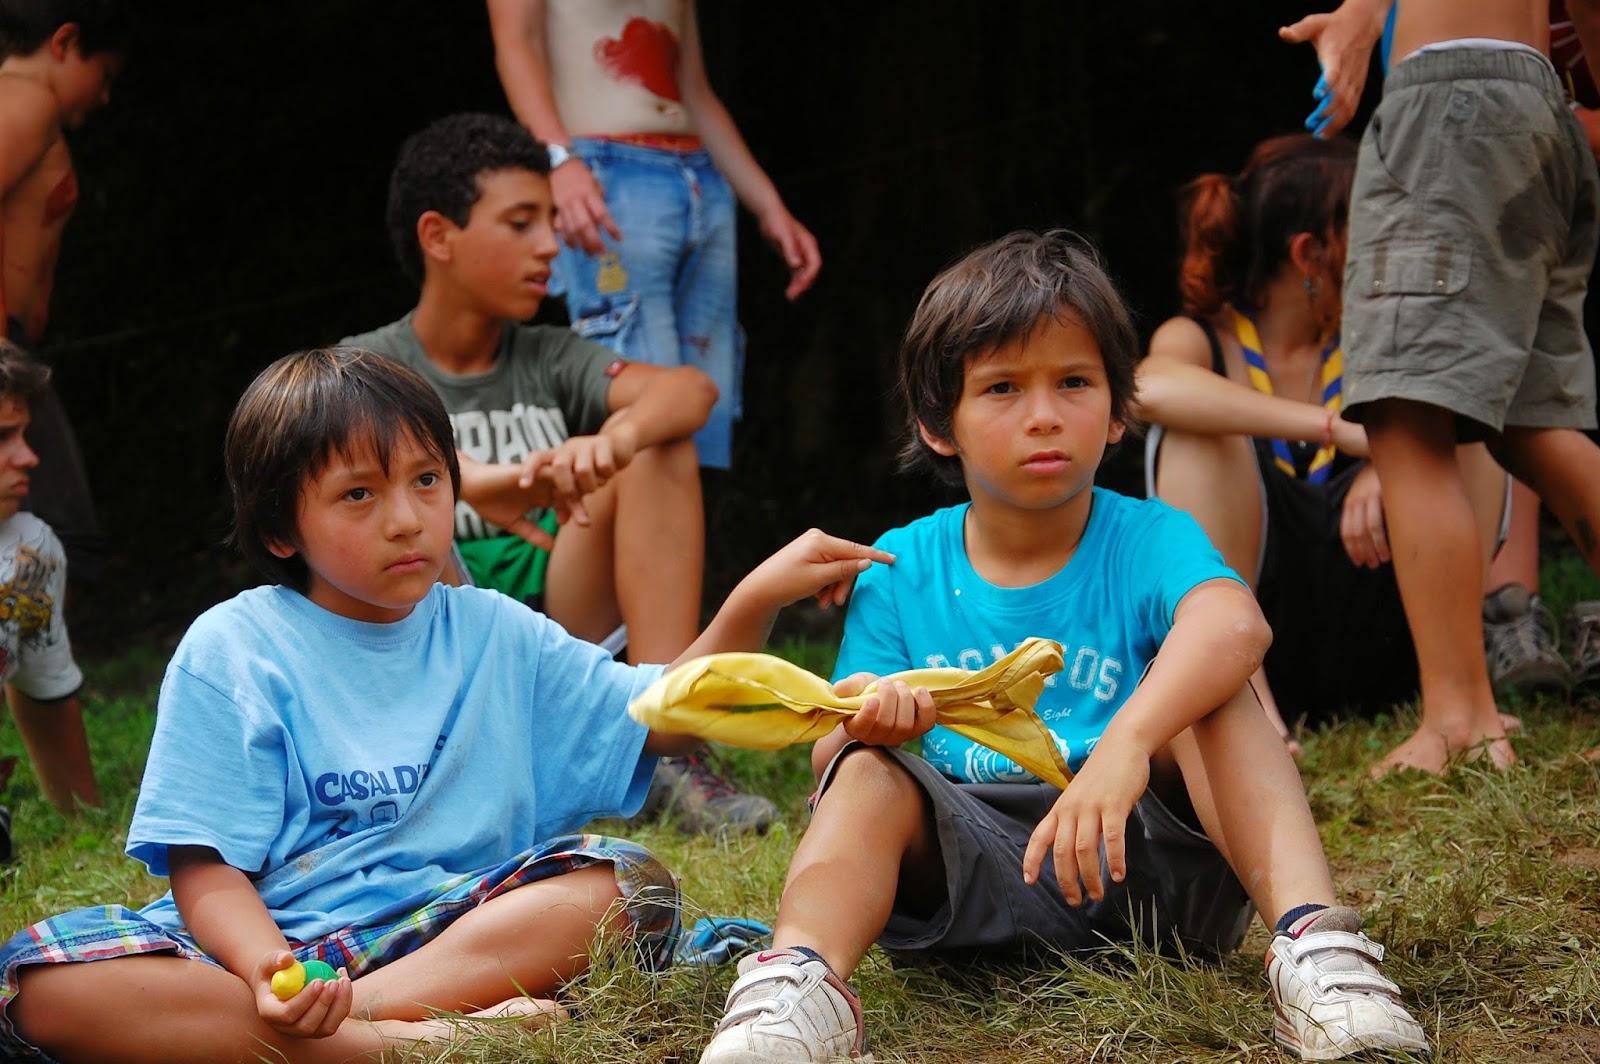 Campaments Estiu RolandKing 2011 - DSC_0305.JPG